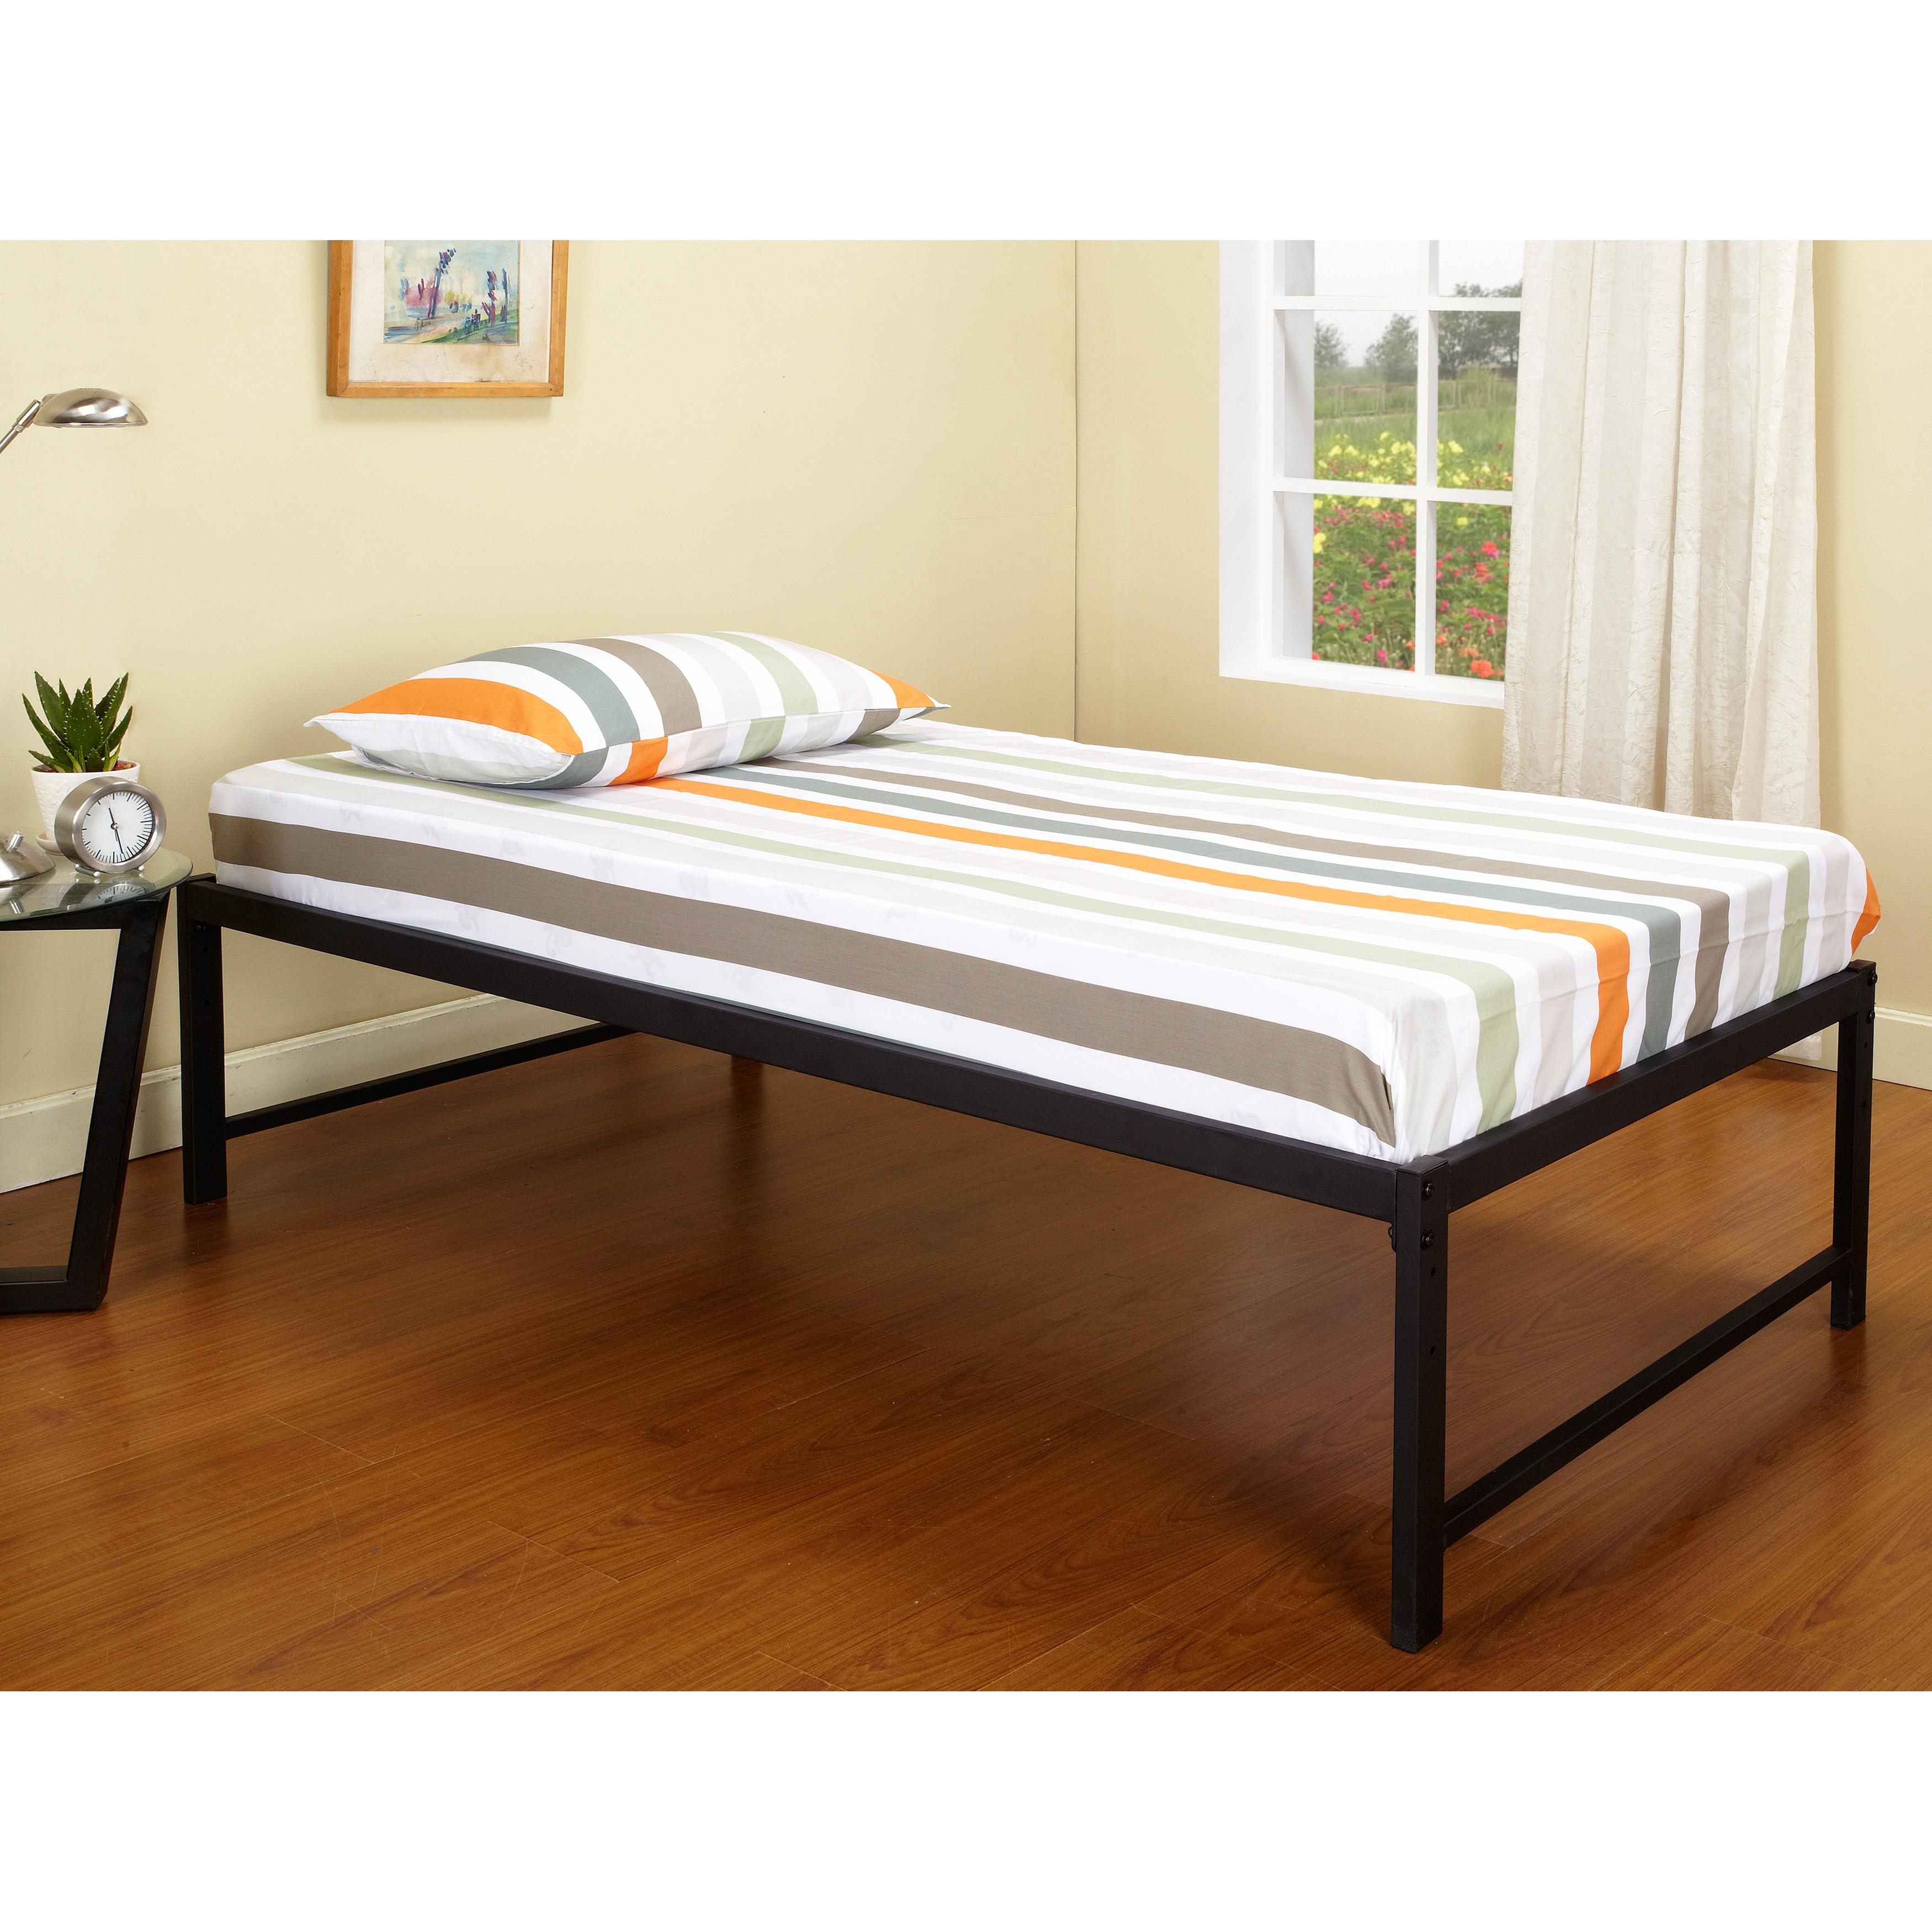 K&B B39-1-2 Hi Riser Bed with Black Metal Frame, Size Twin